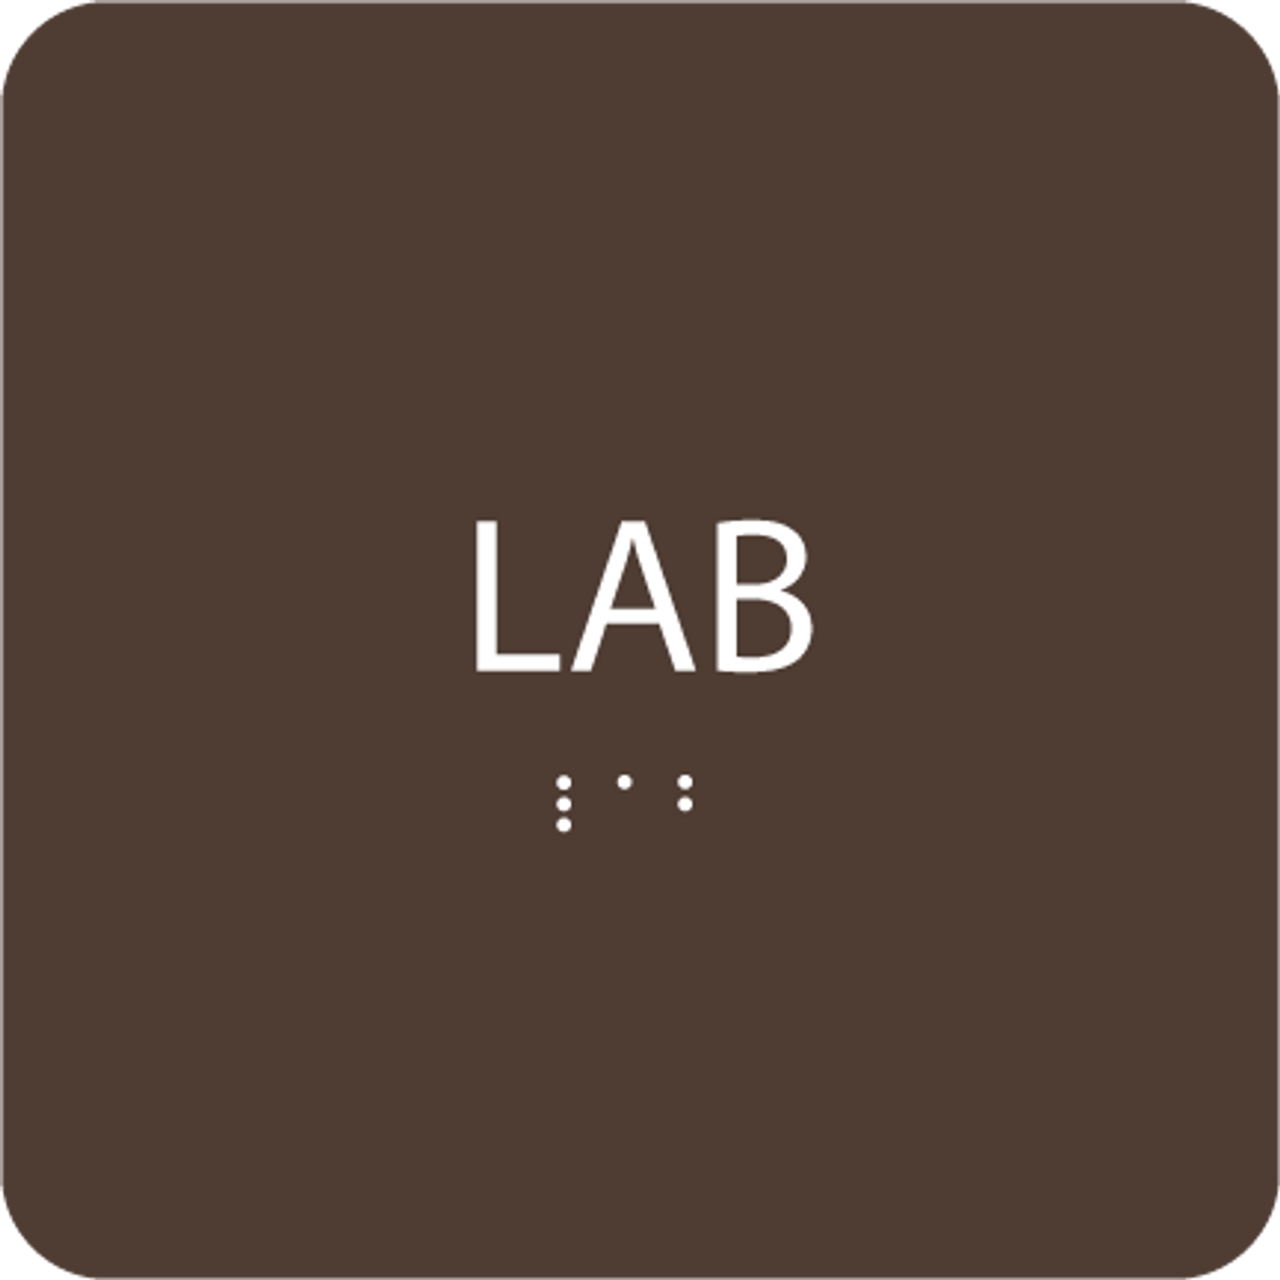 Dark Brown Lab ADA Sign